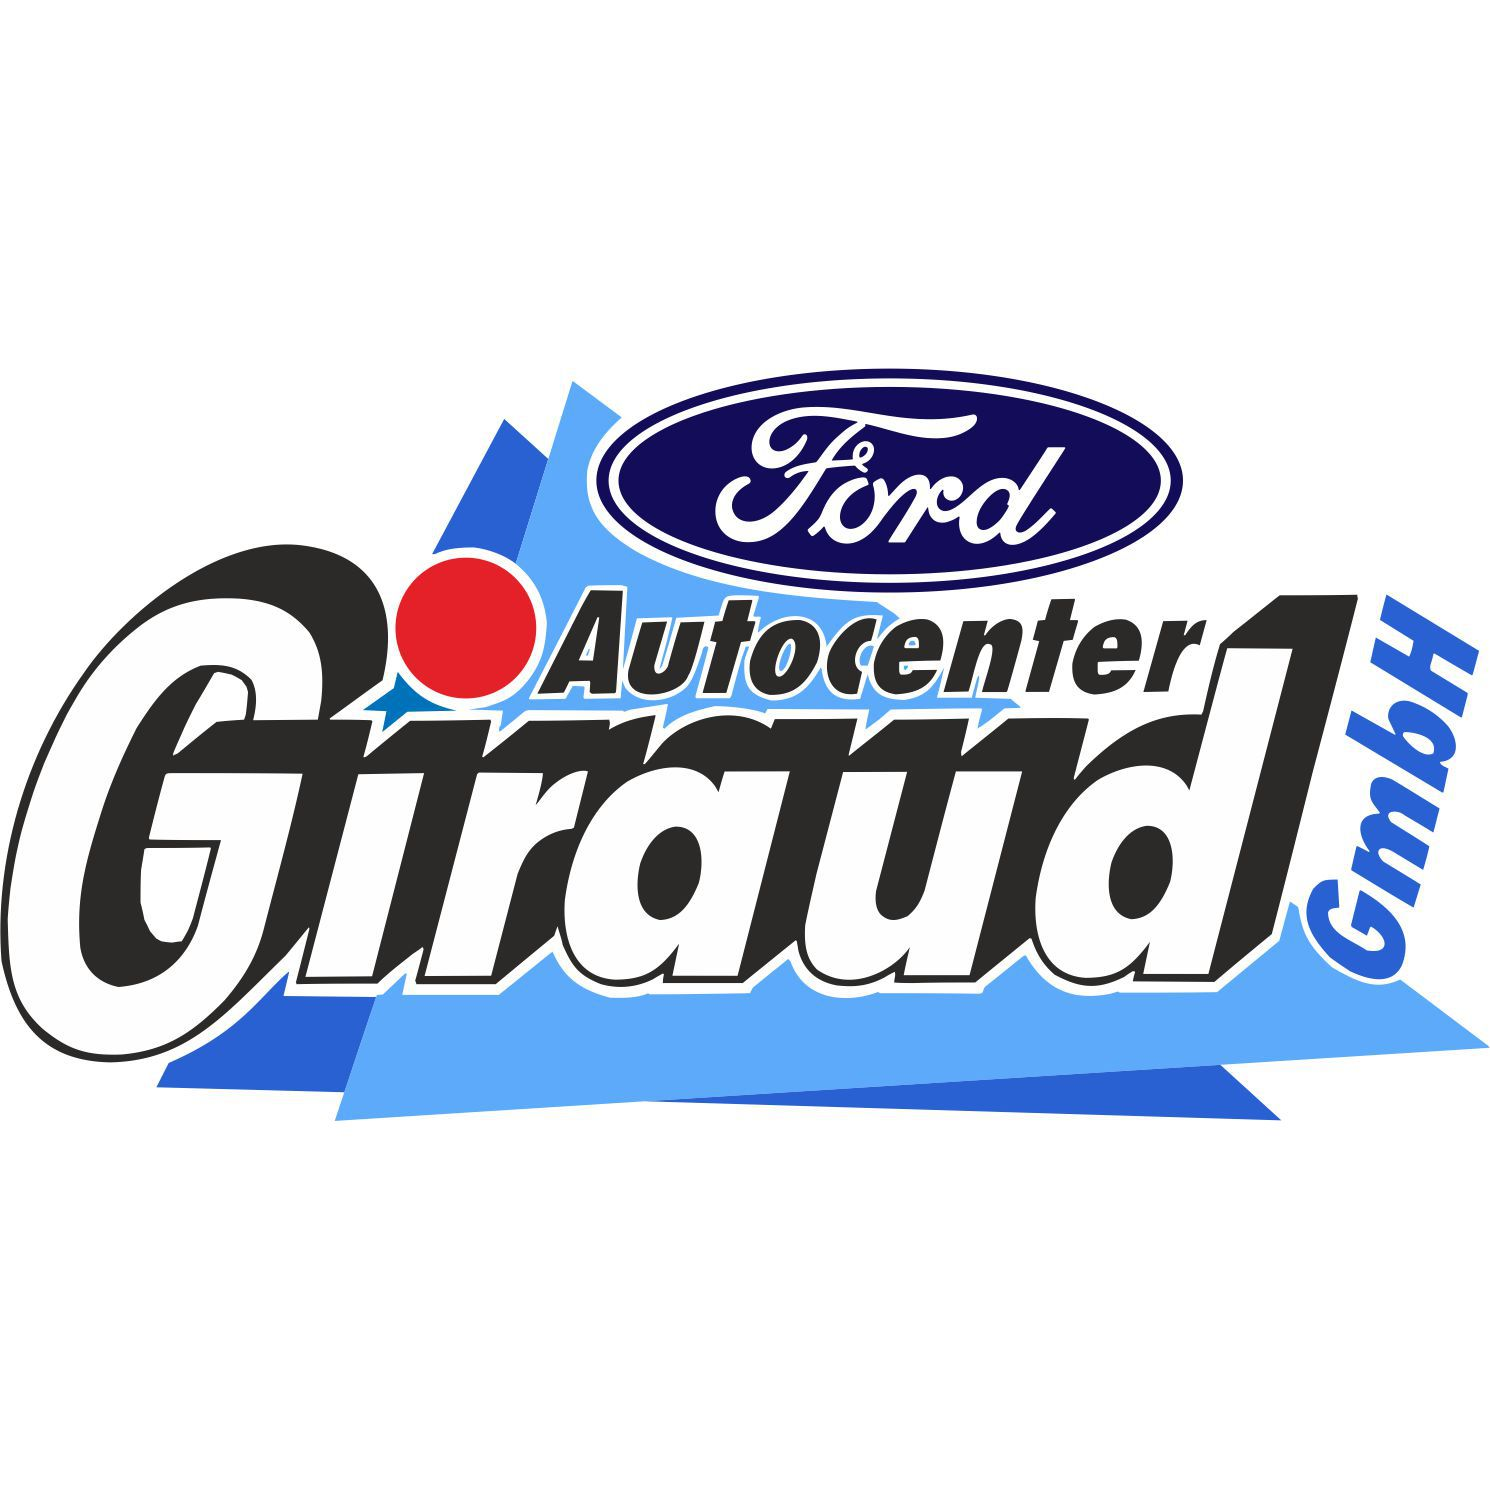 Bild zu Autocenter Giraud GmbH in Stutensee